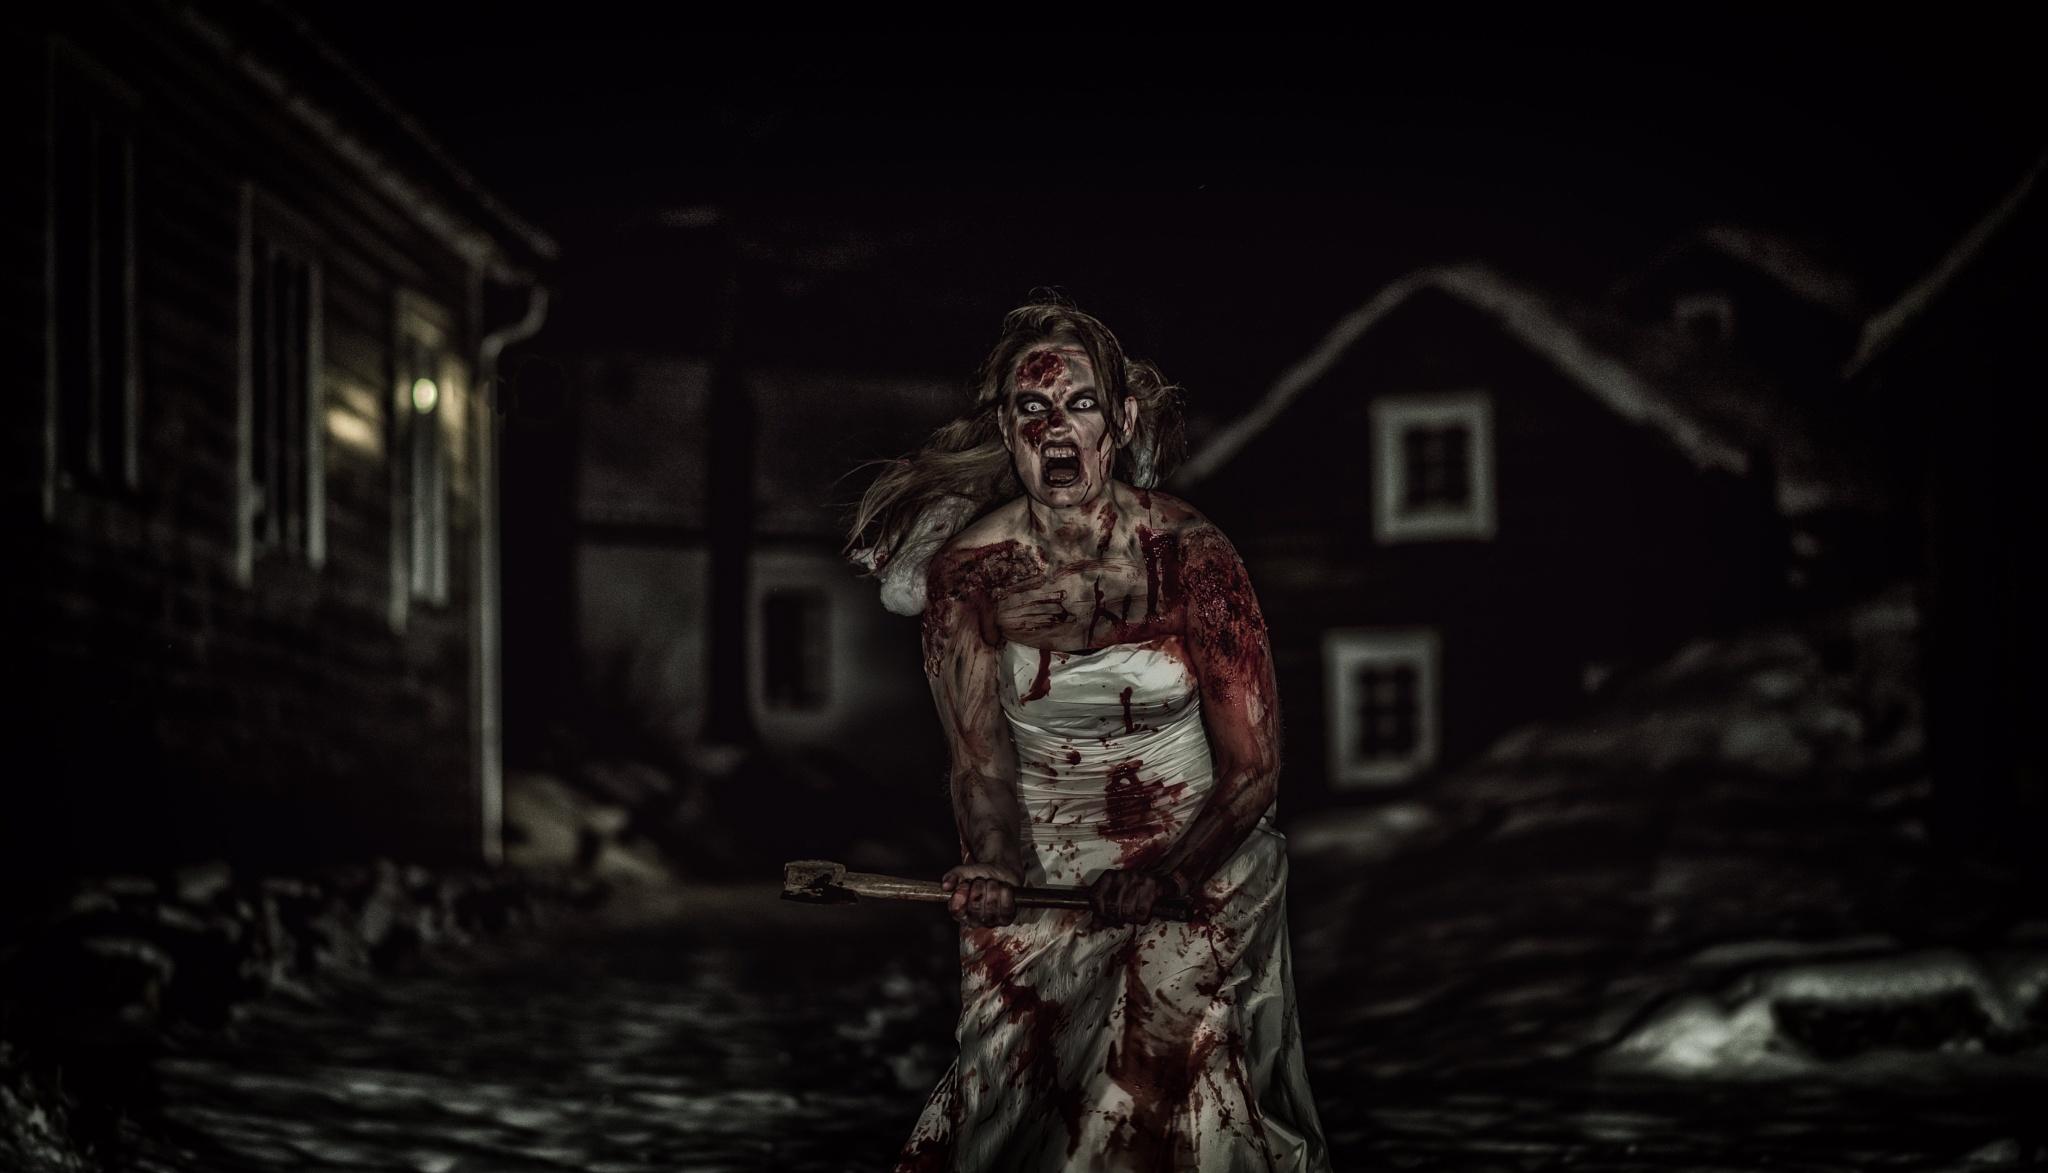 Zombie Bride 4 by Jørn Lavoll